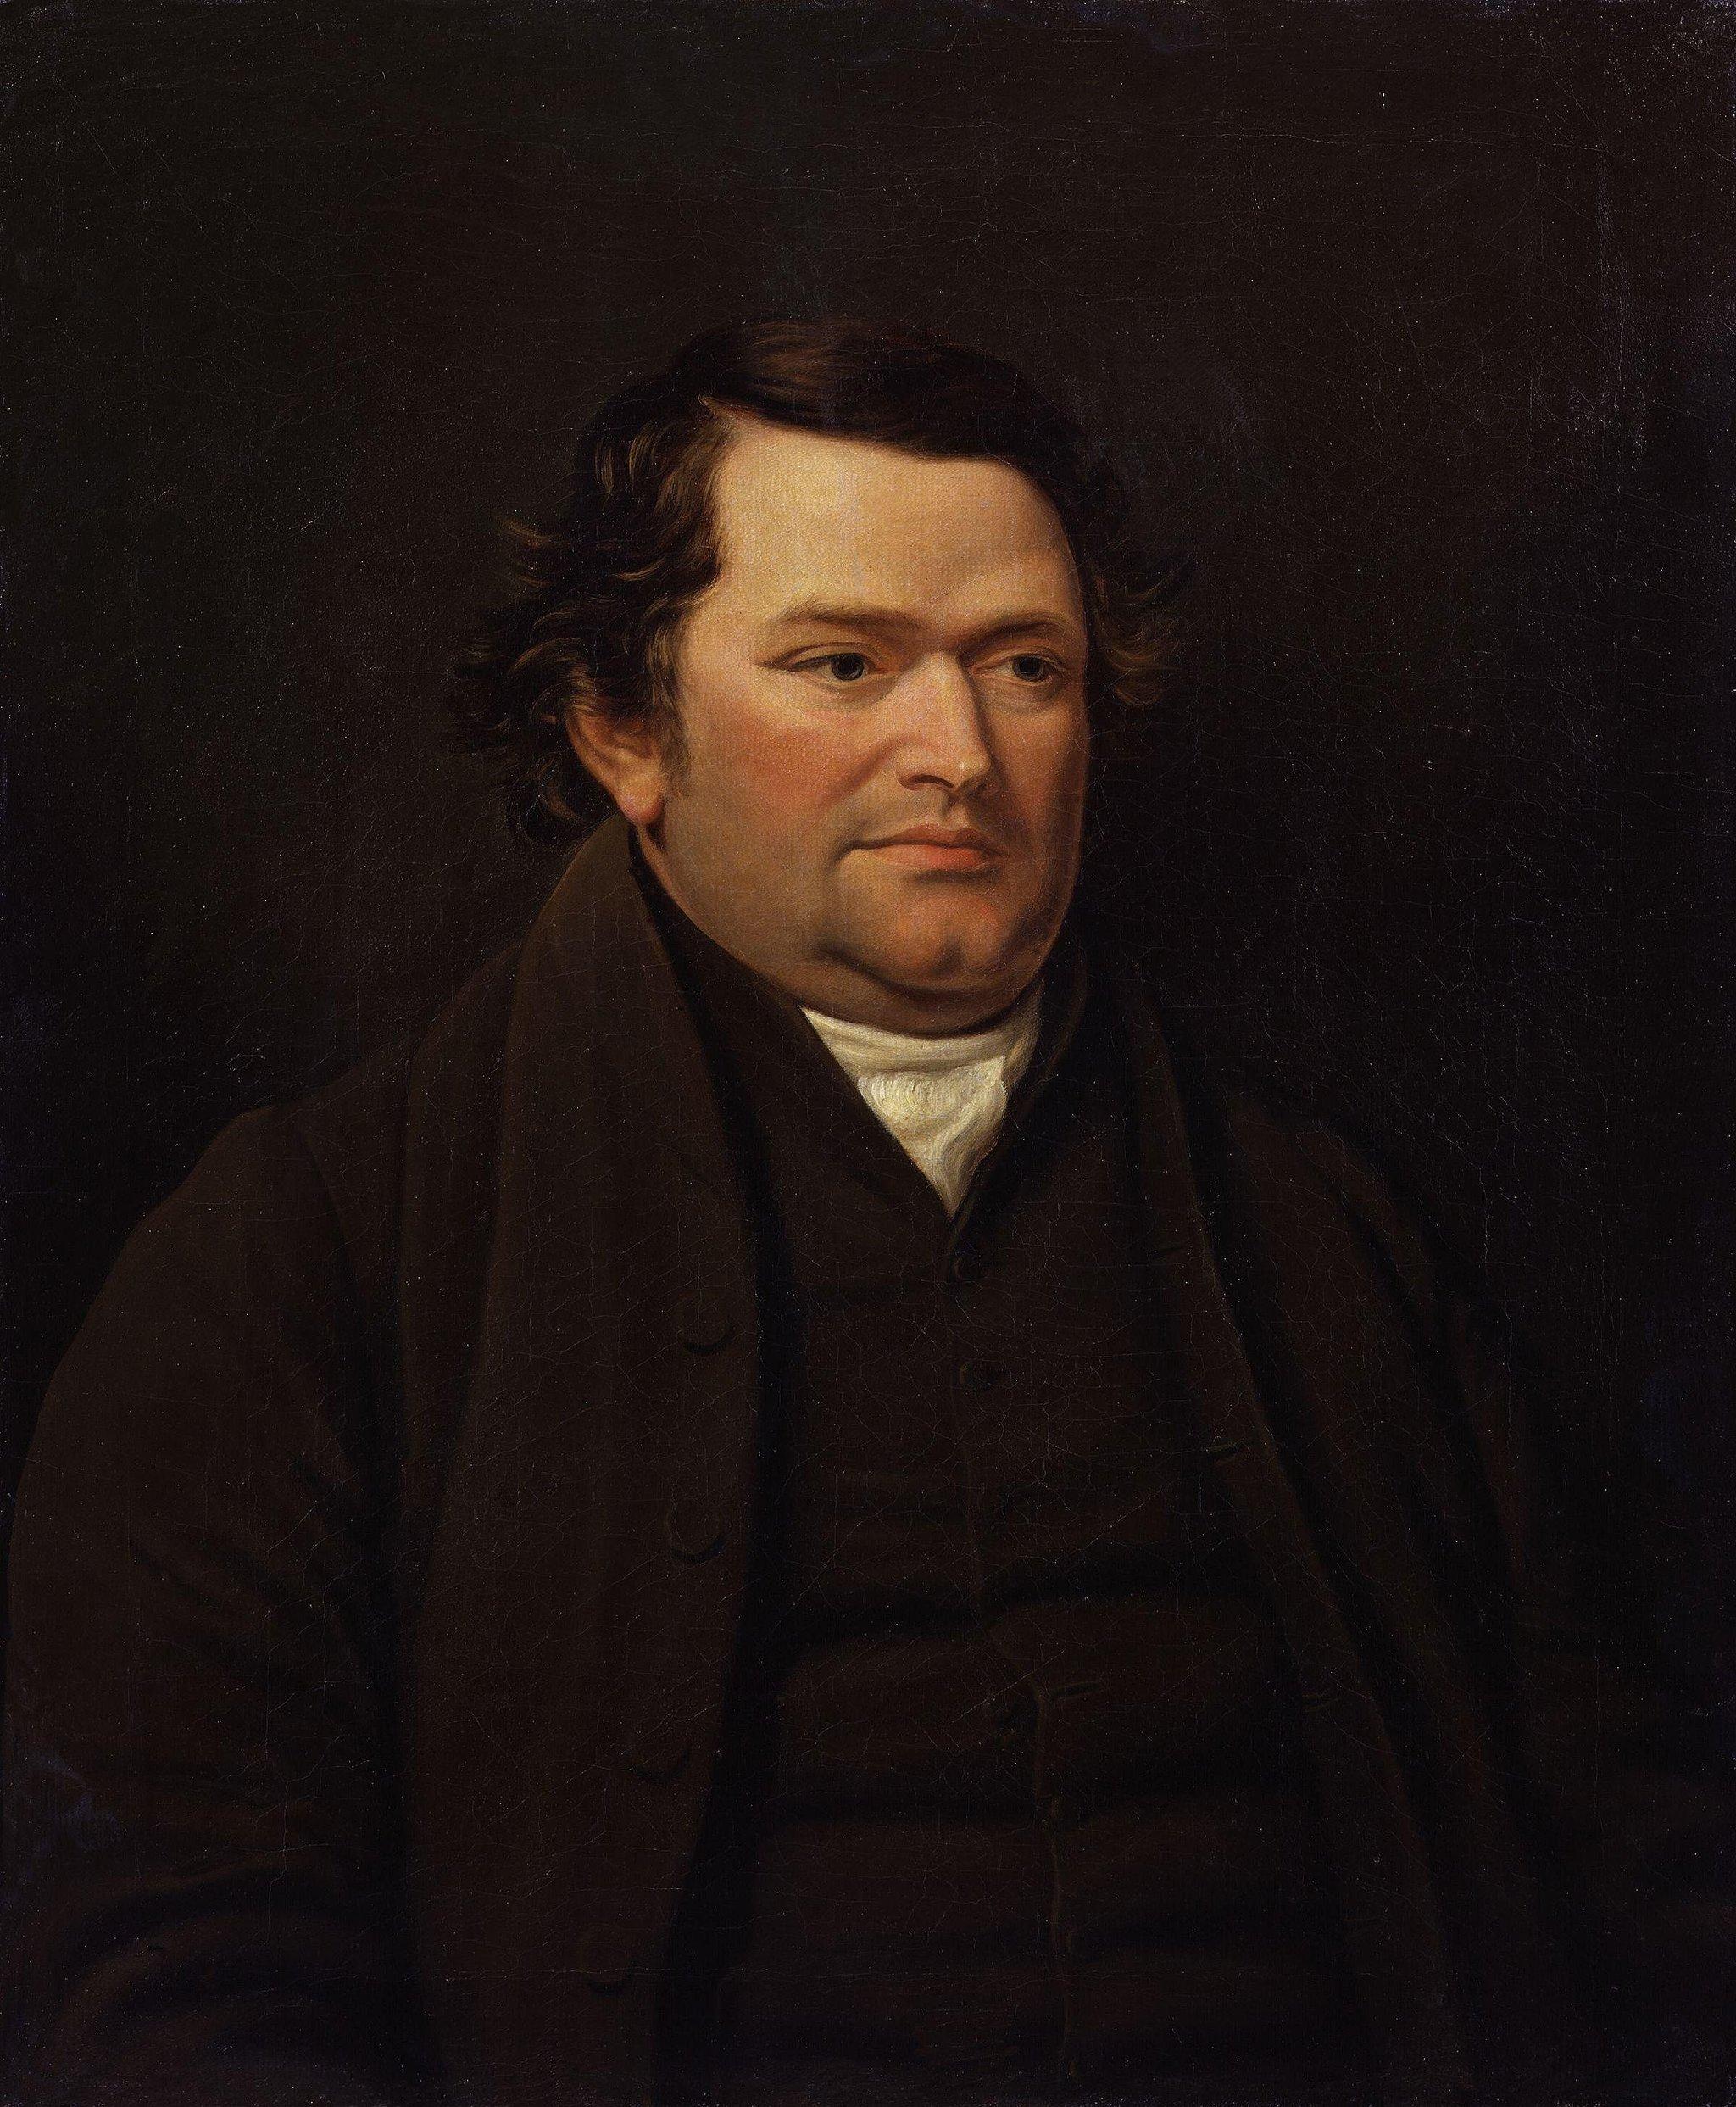 Джон Хазлитт. Джозеф Ланкастер. 1820-е